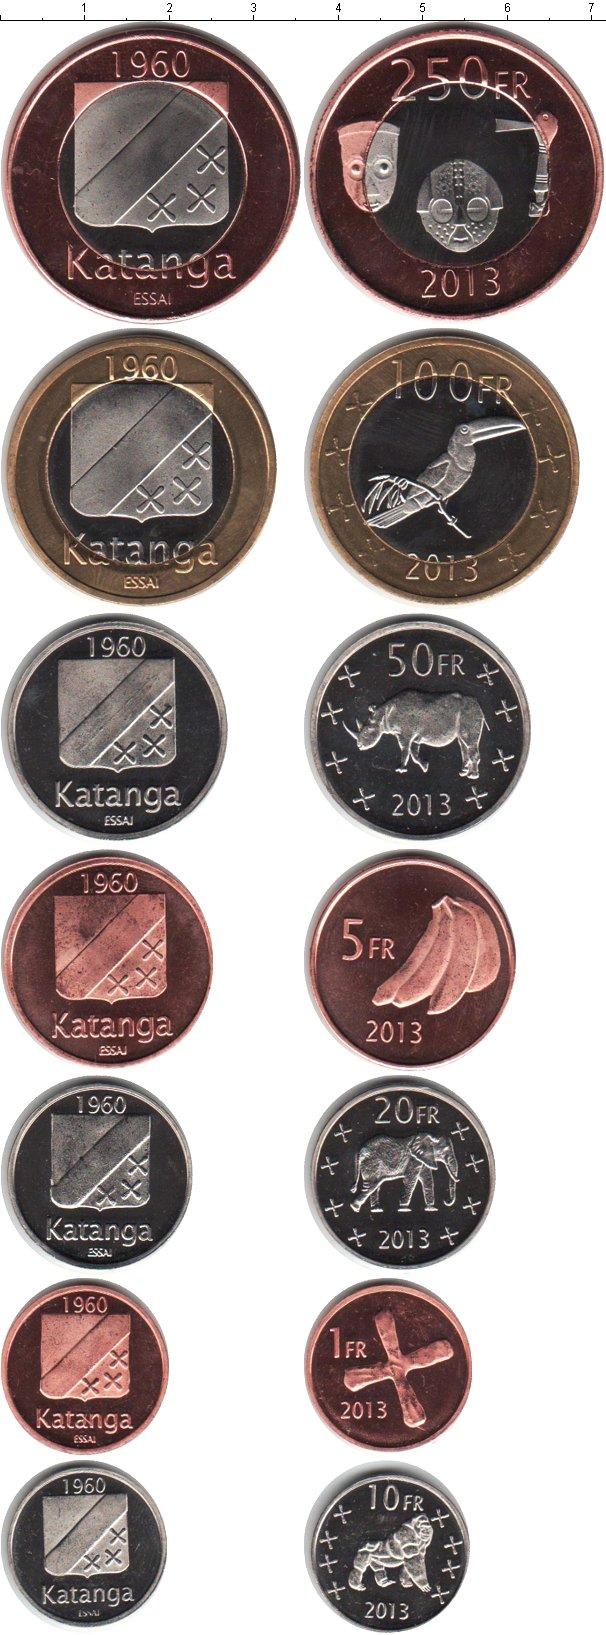 Картинка Наборы монет Катанга Катанга 2013  2013